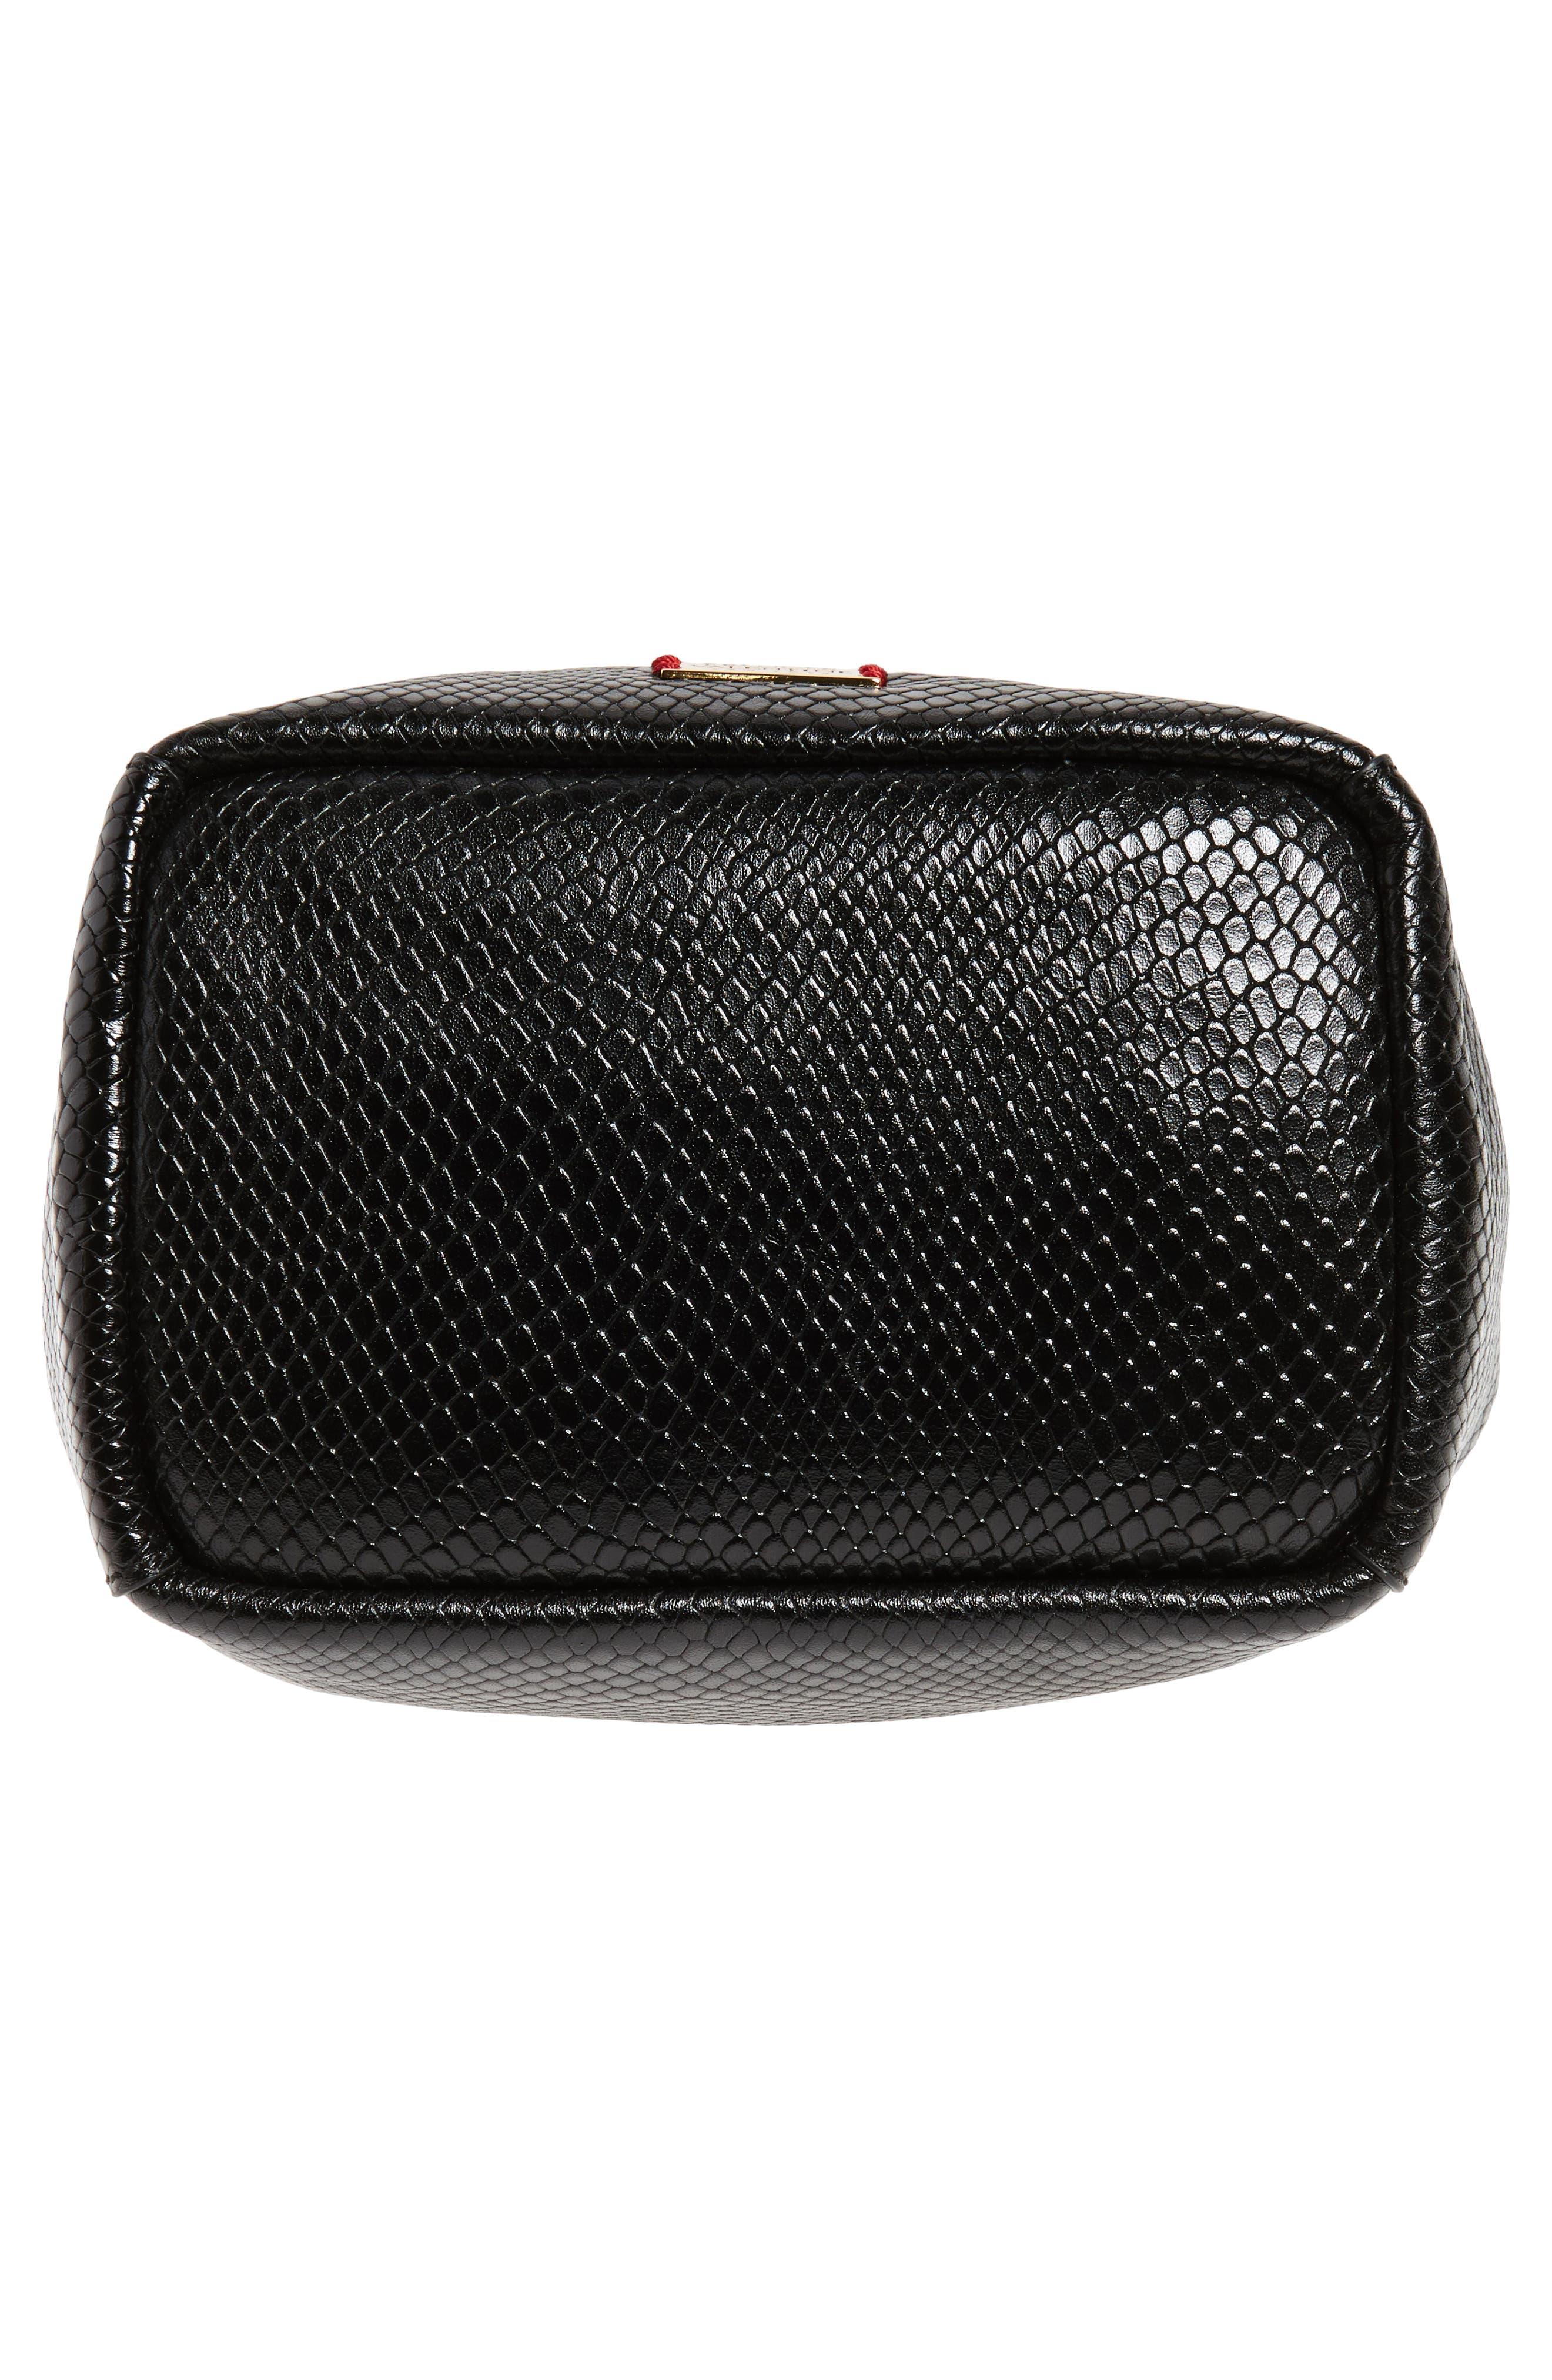 Small Snakeskin Embossed Leather Bucket Bag,                             Alternate thumbnail 6, color,                             001